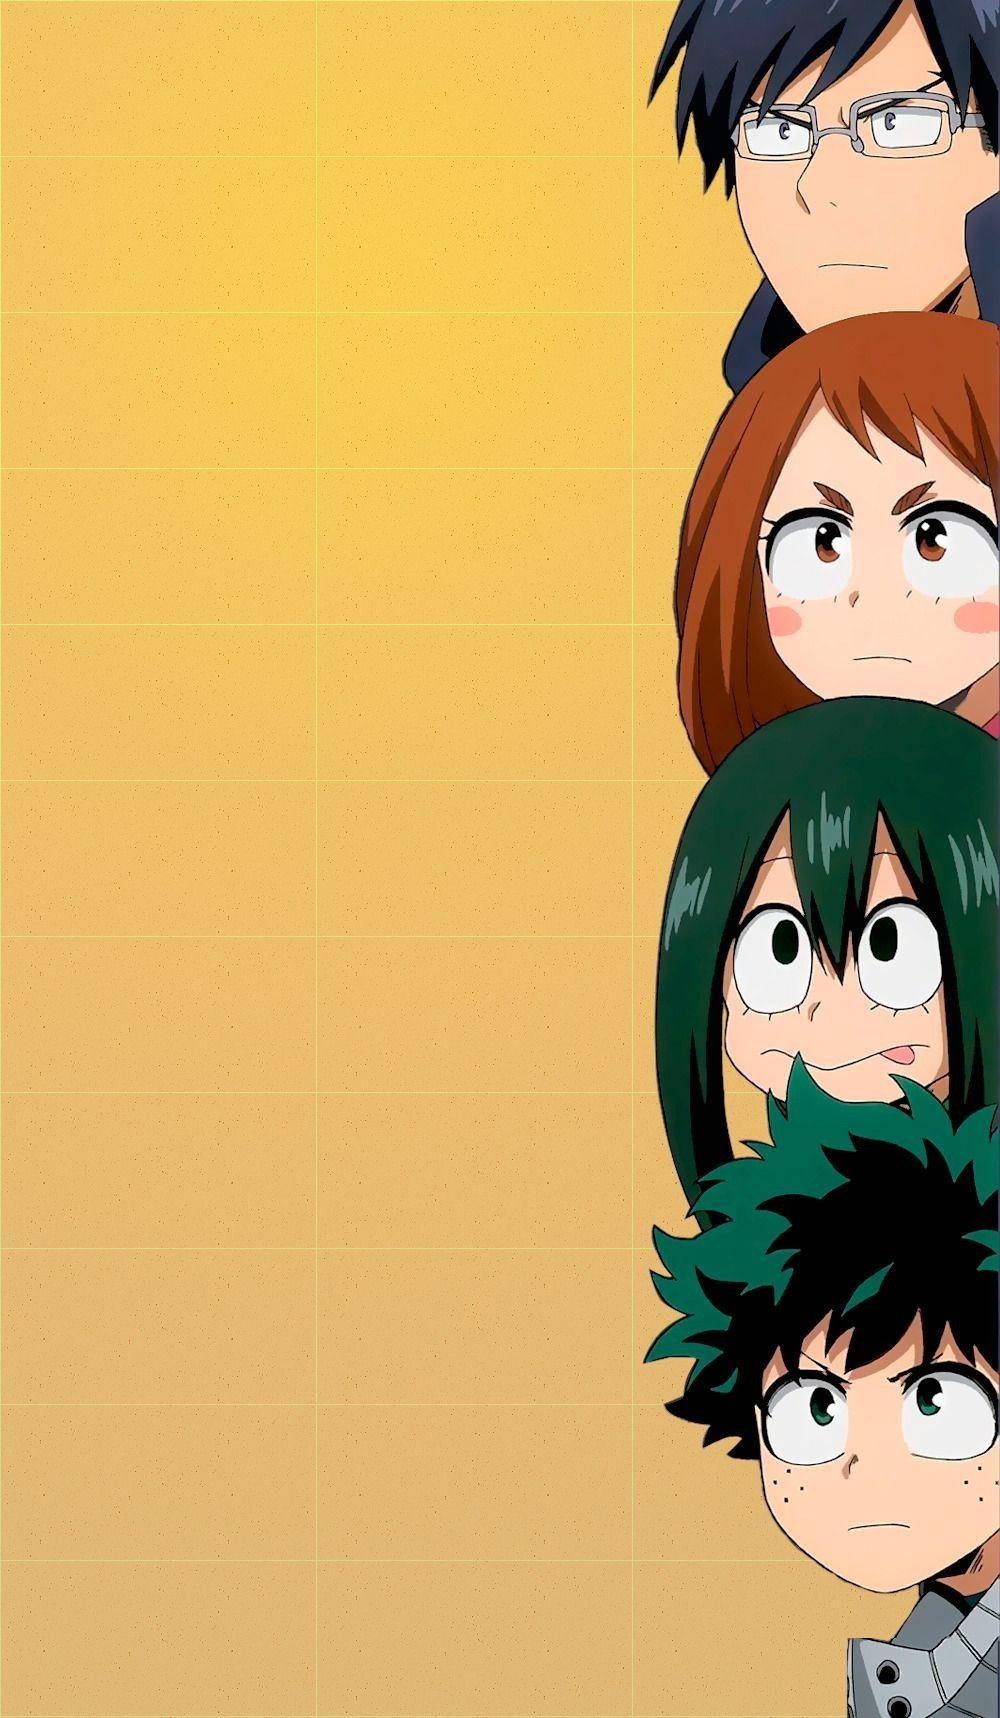 Pin By Rinnota On Boku No Hero Academia Hero Wallpaper My Hero Academia Episodes Anime Wallpaper